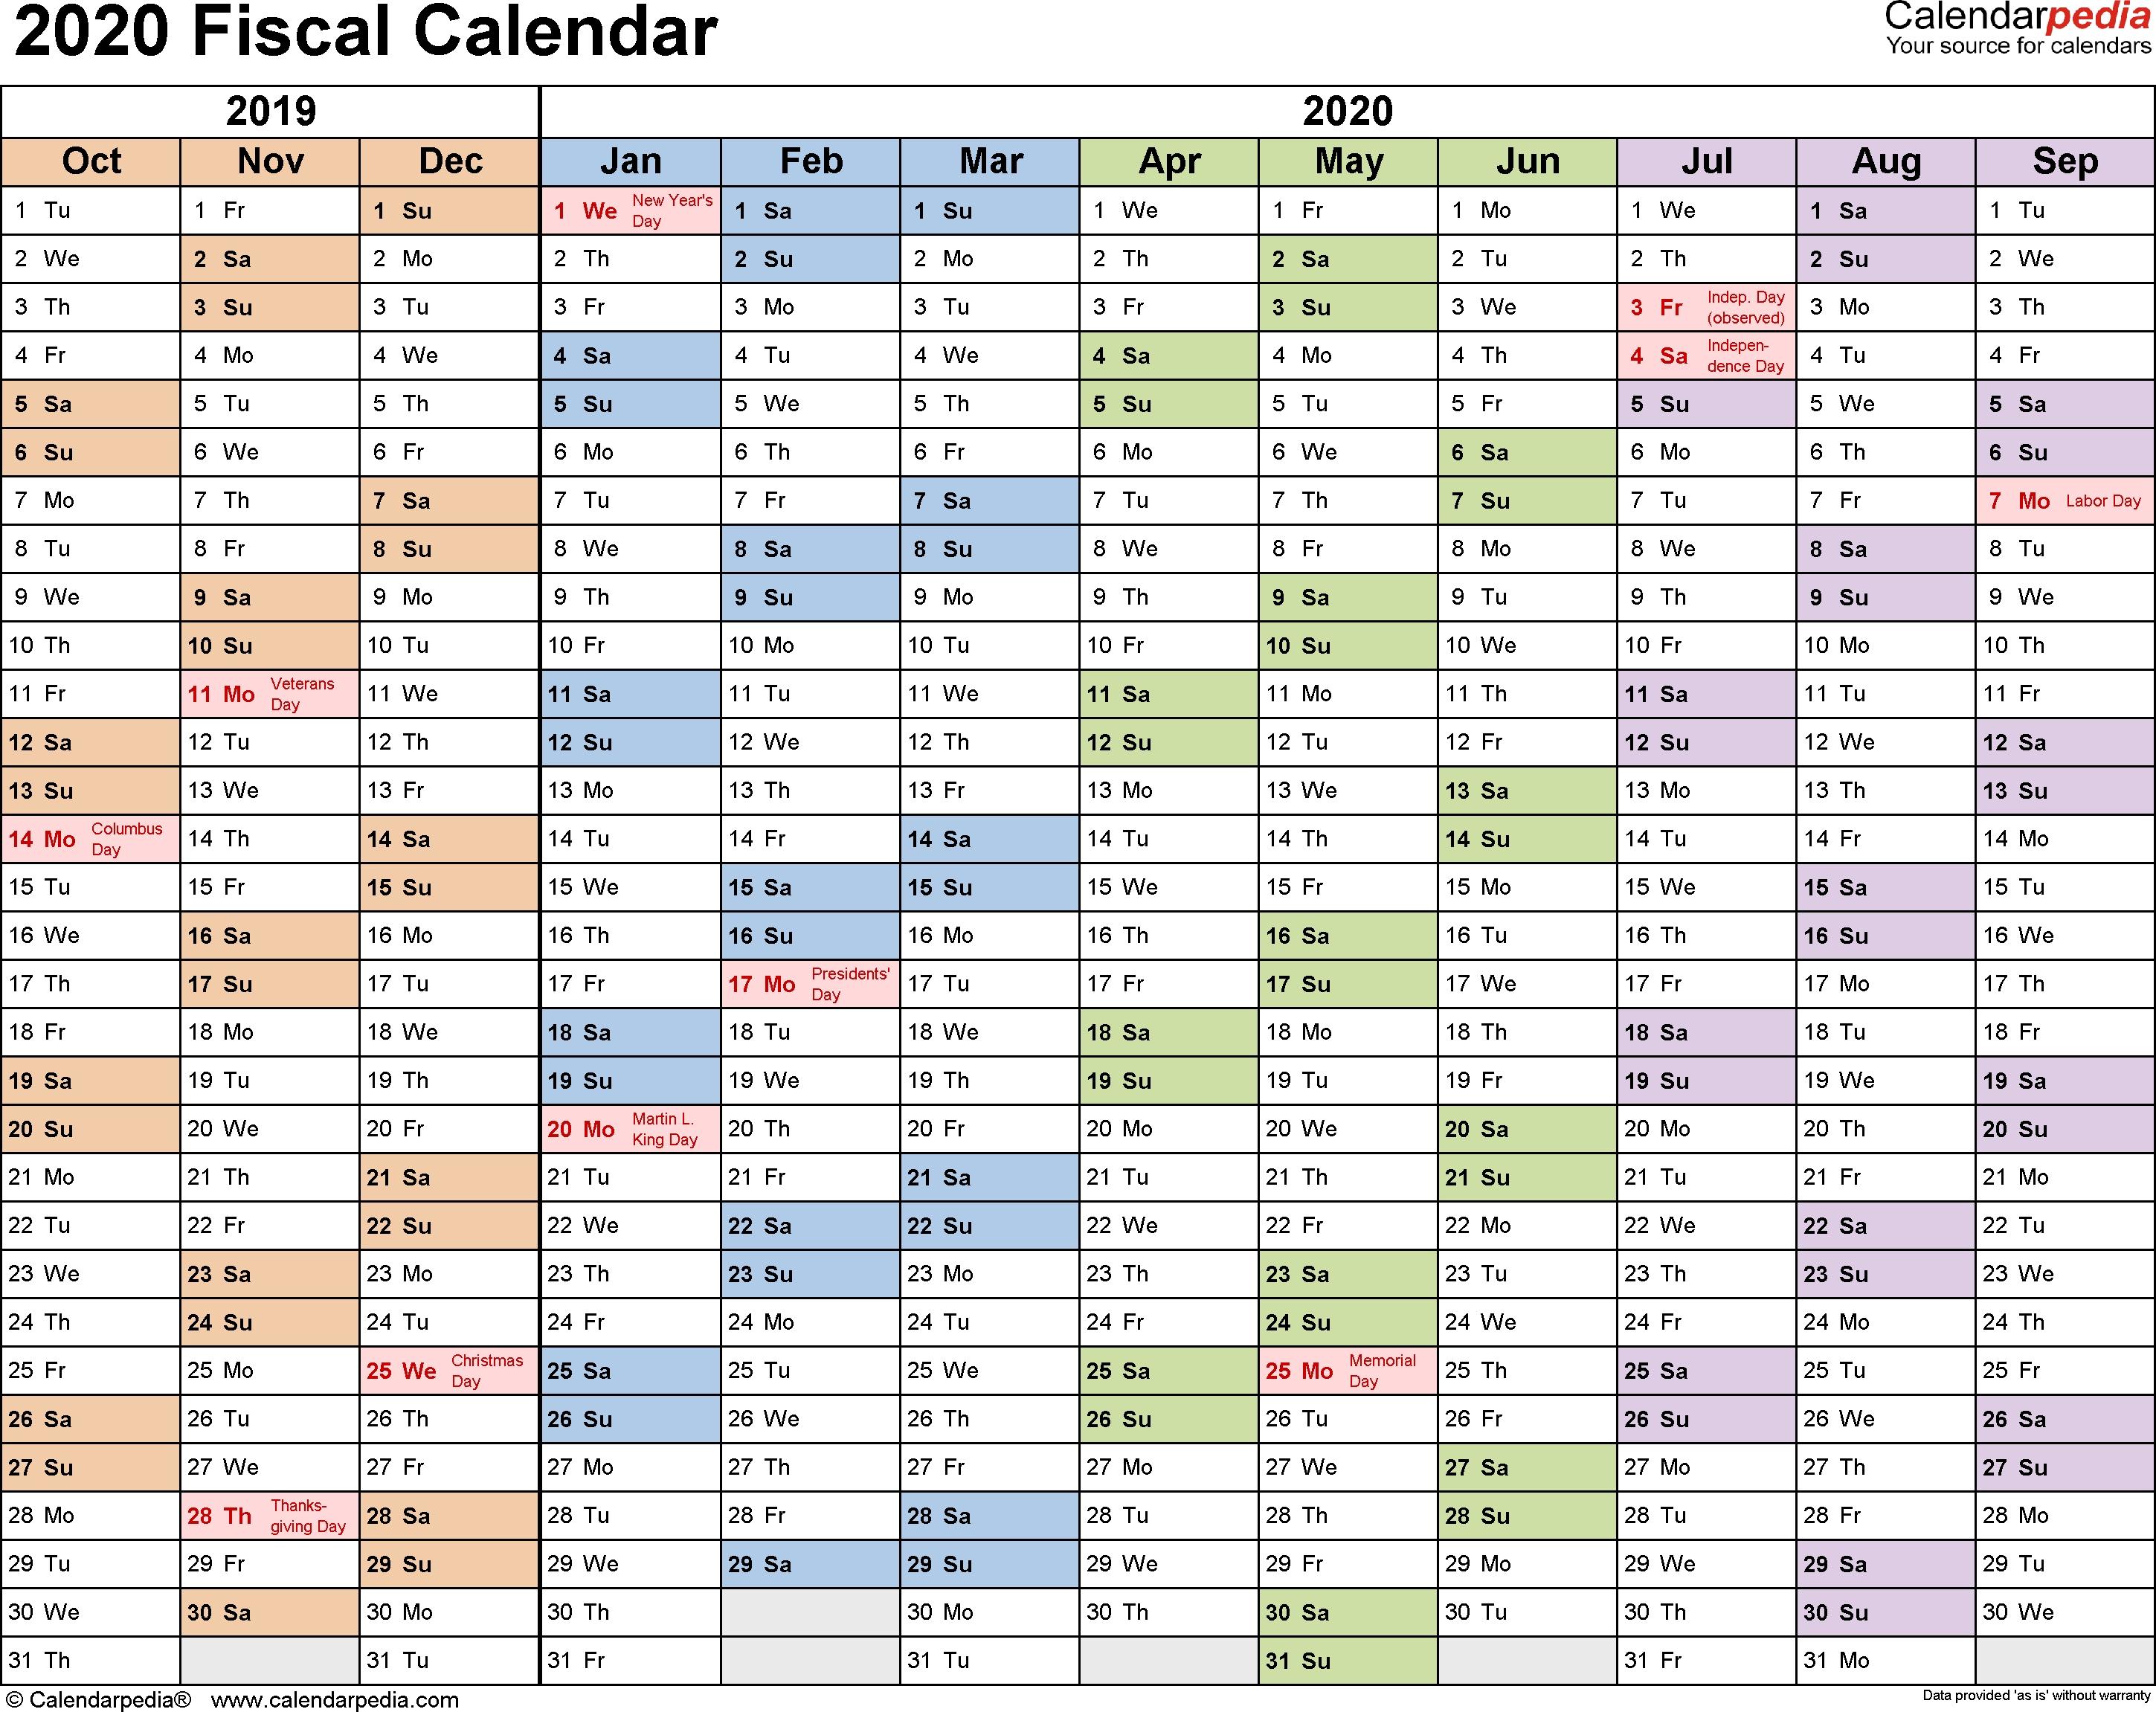 Fy 2020 Calendar - Colona.rsd7 in 2020 Federal Pay Period Calendar Printable